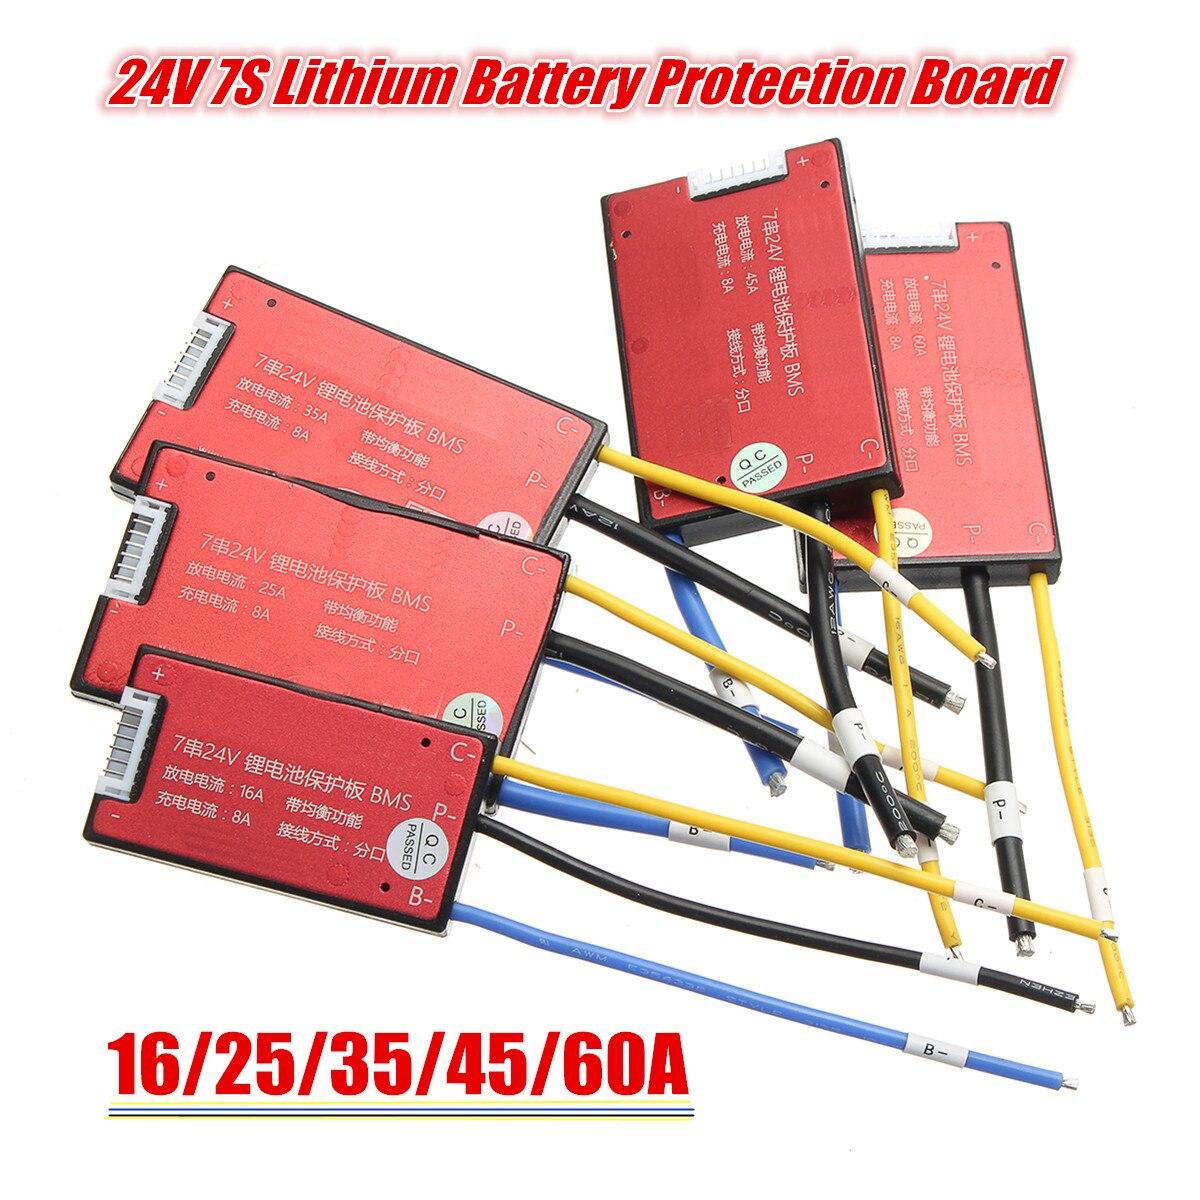 16 v/25A/35A/45A/60A 7 s 18650 Li-Ion Lipolymer Batterie BMS PCB PCM Batterie schutz Bord für Ebike Ebicycle